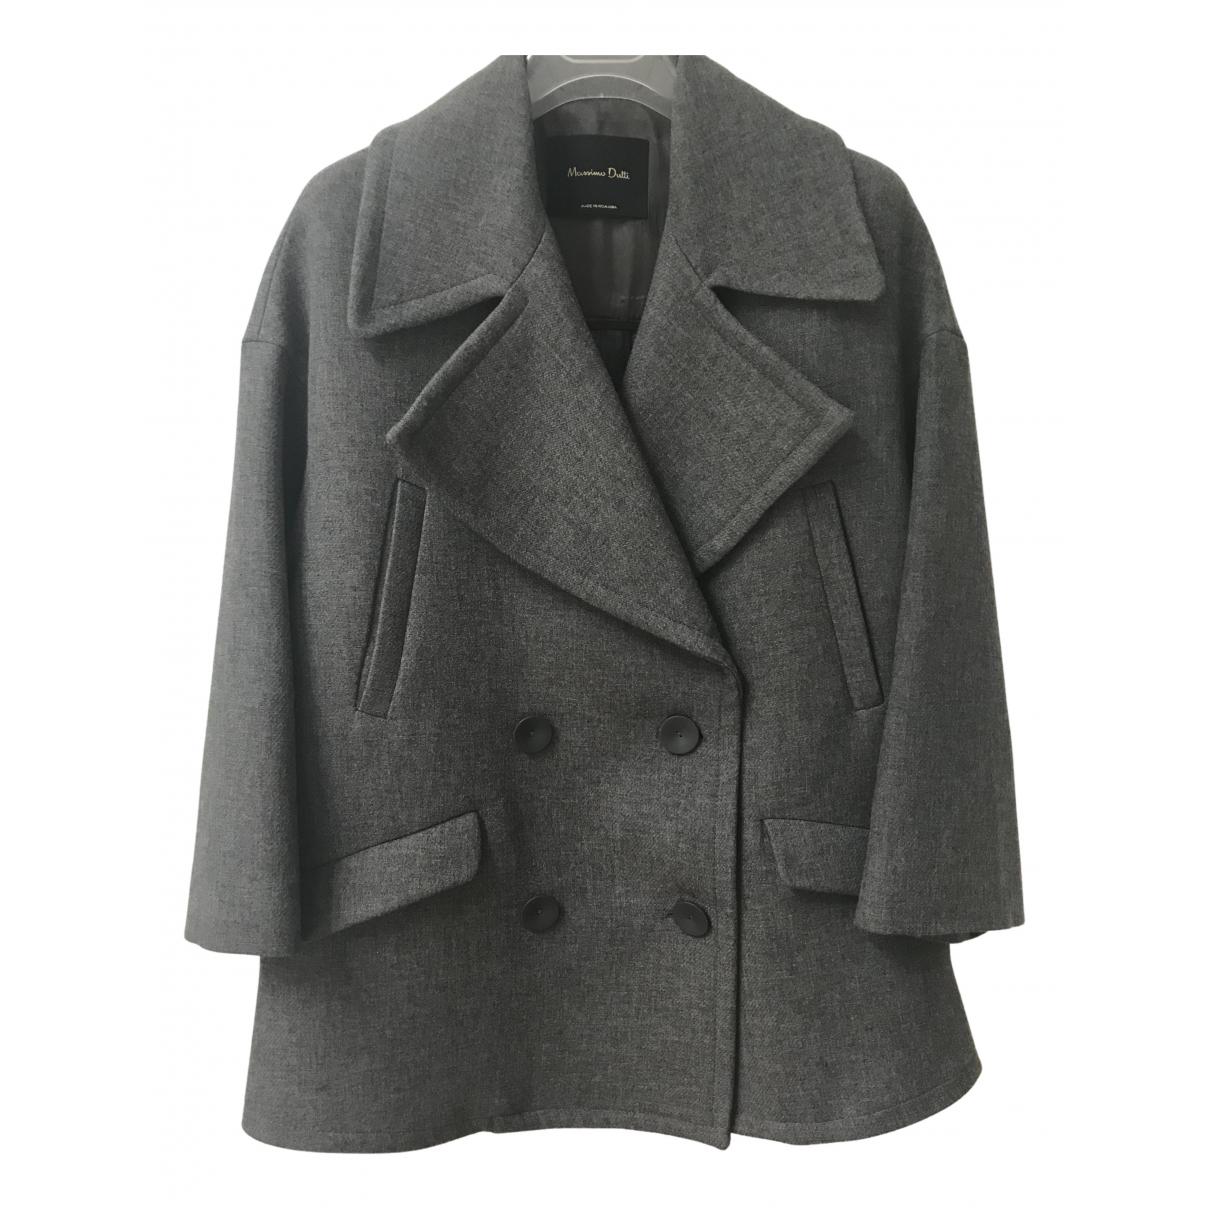 Massimo Dutti \N Jacke in  Grau Viskose